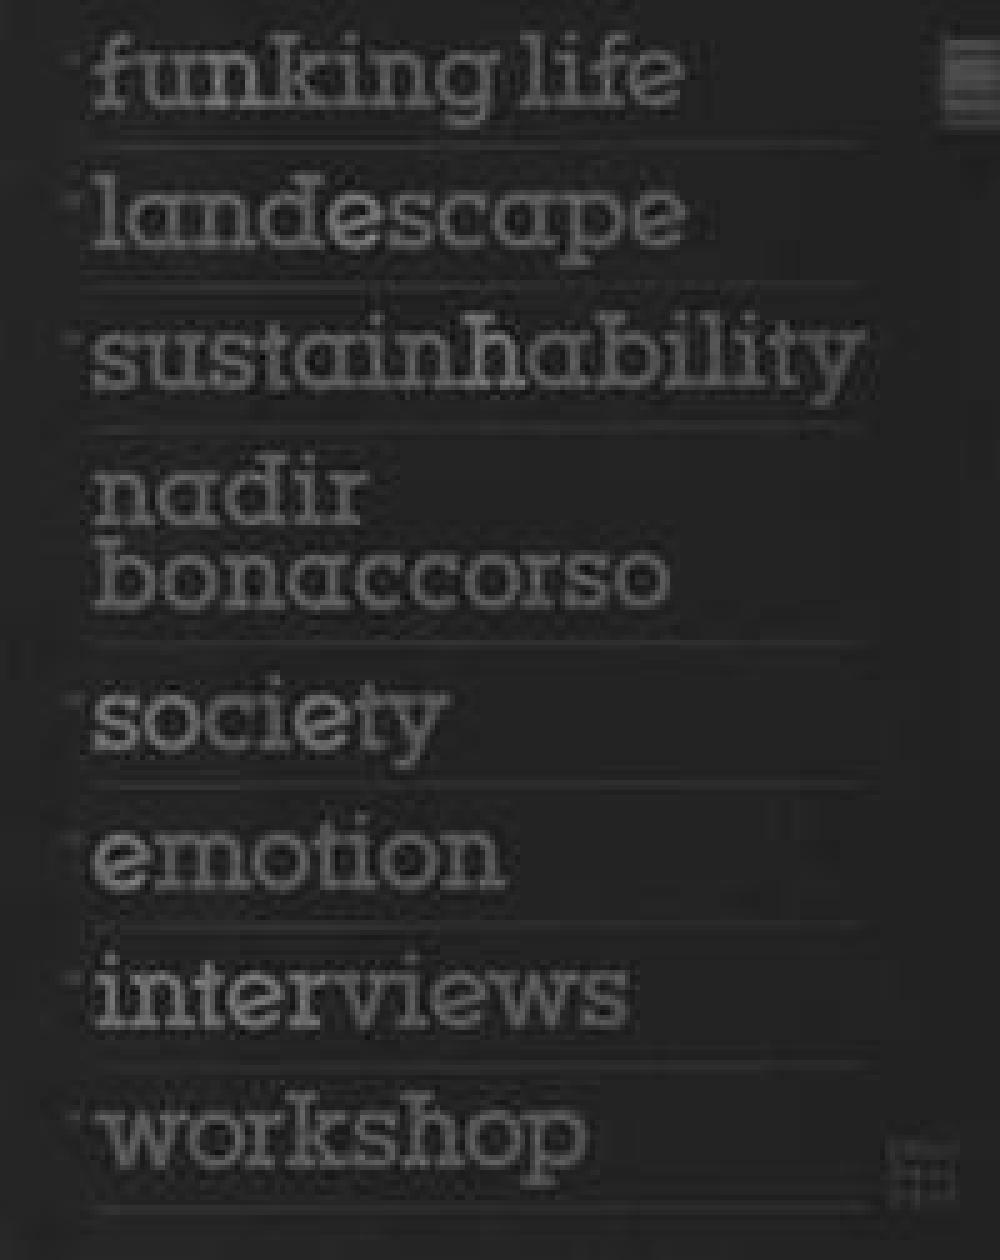 Funking Life: Landescape, Sustainhability